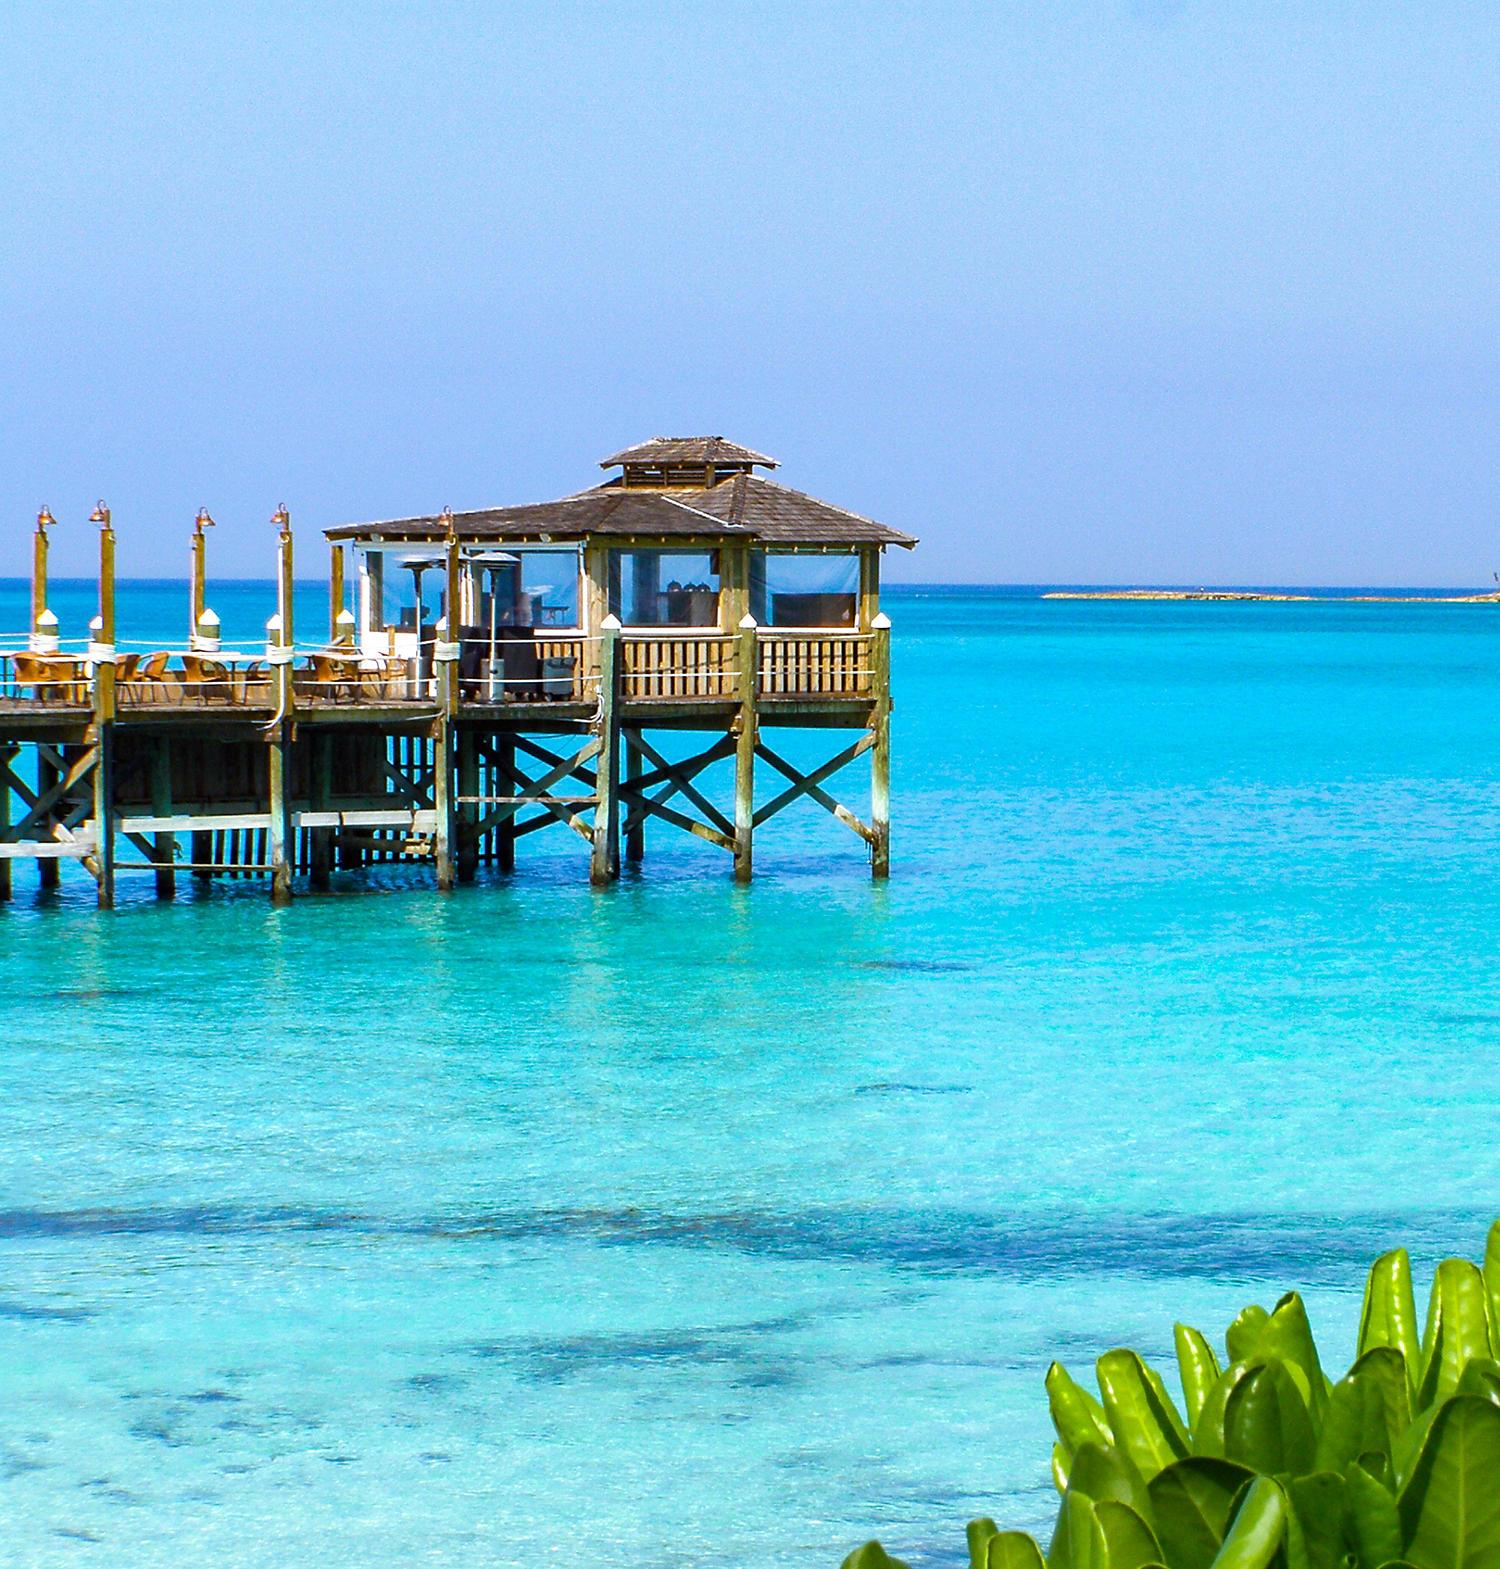 Cable Beach Nau Bahamas Blue Water Resort